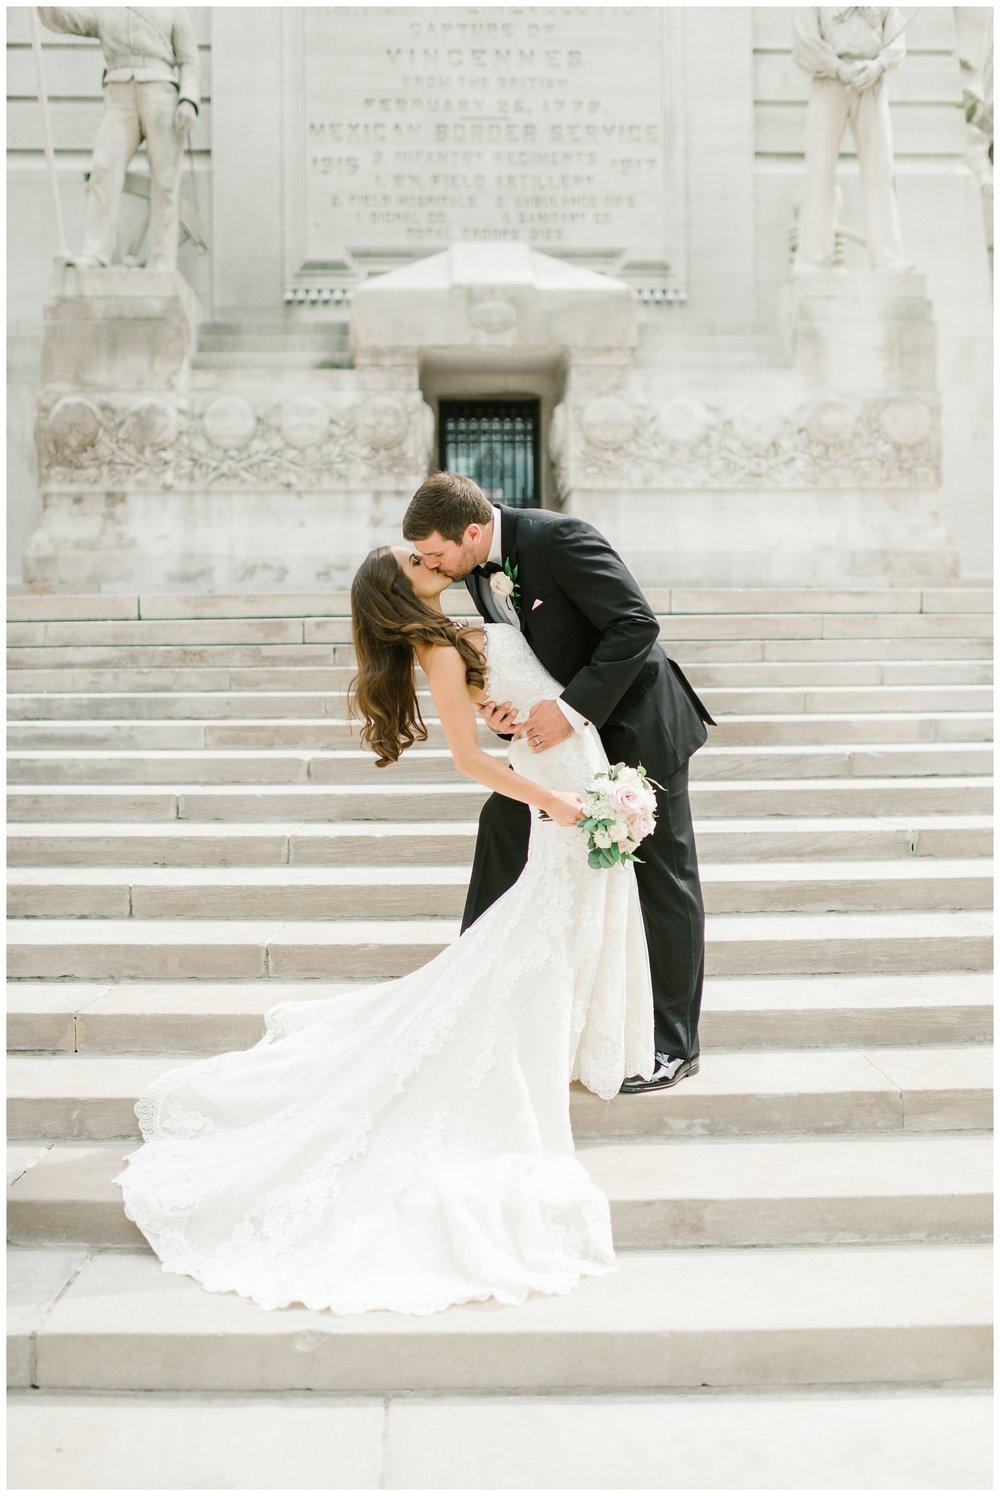 Rebecca_Bridges_Photography_Indianapolis_Wedding_Photographer_6835.jpg